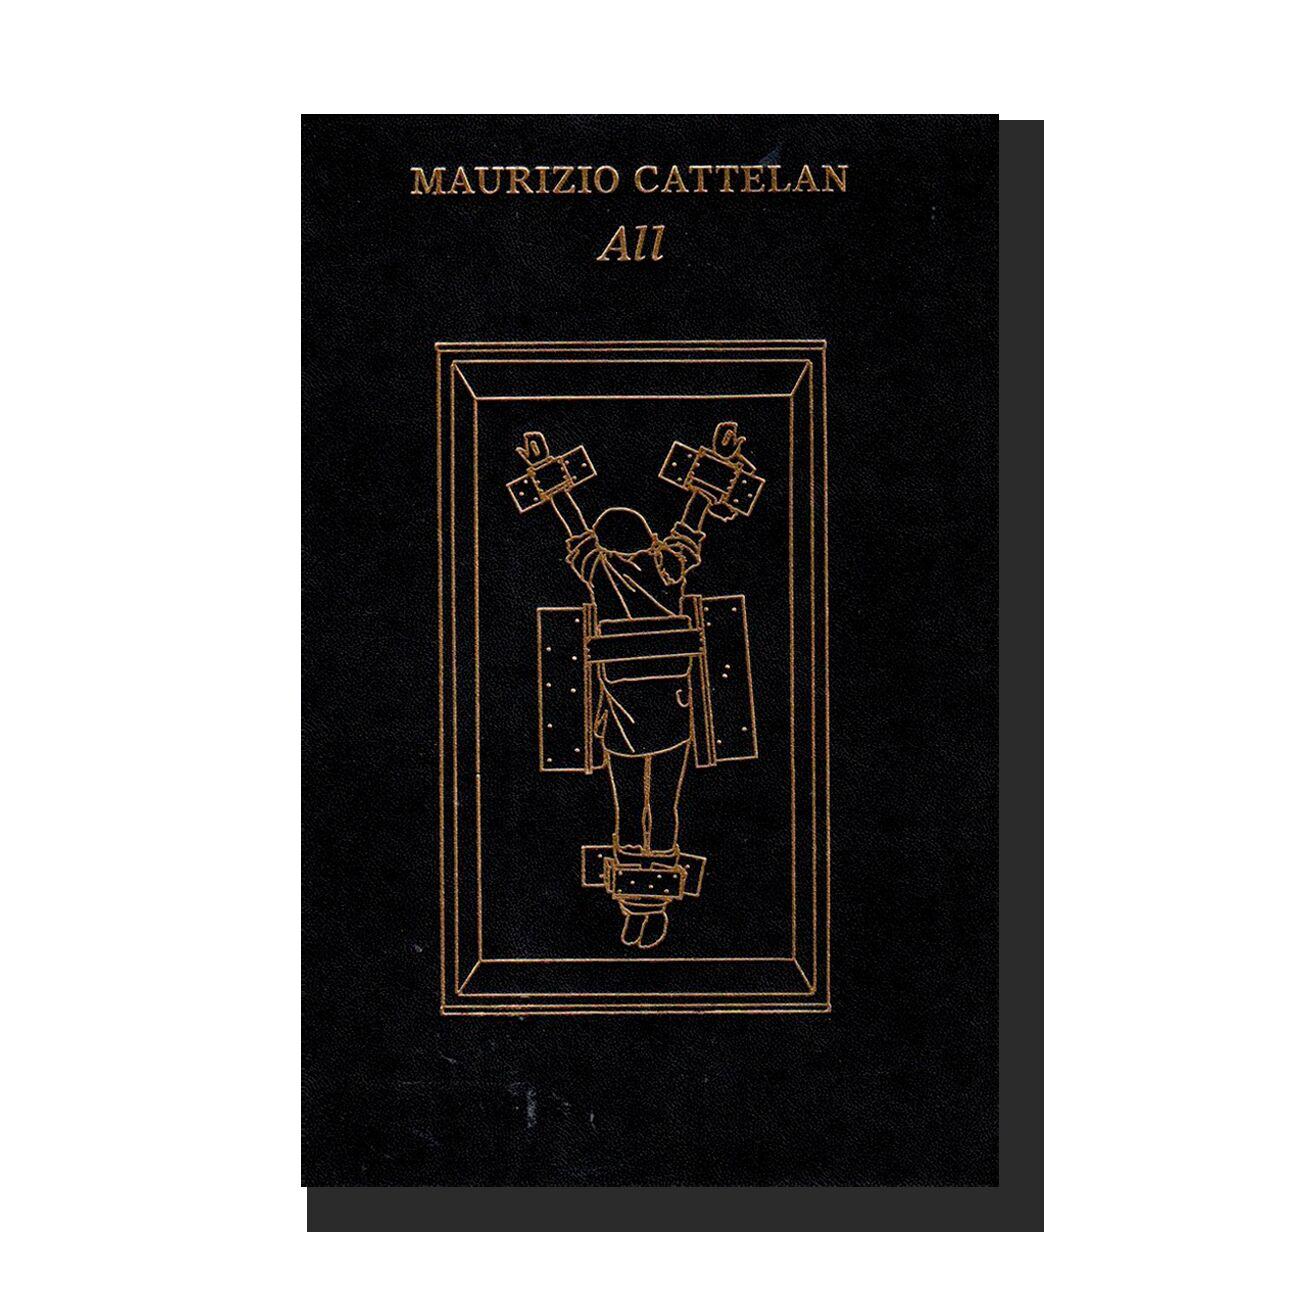 Maurizio Cattelan: All